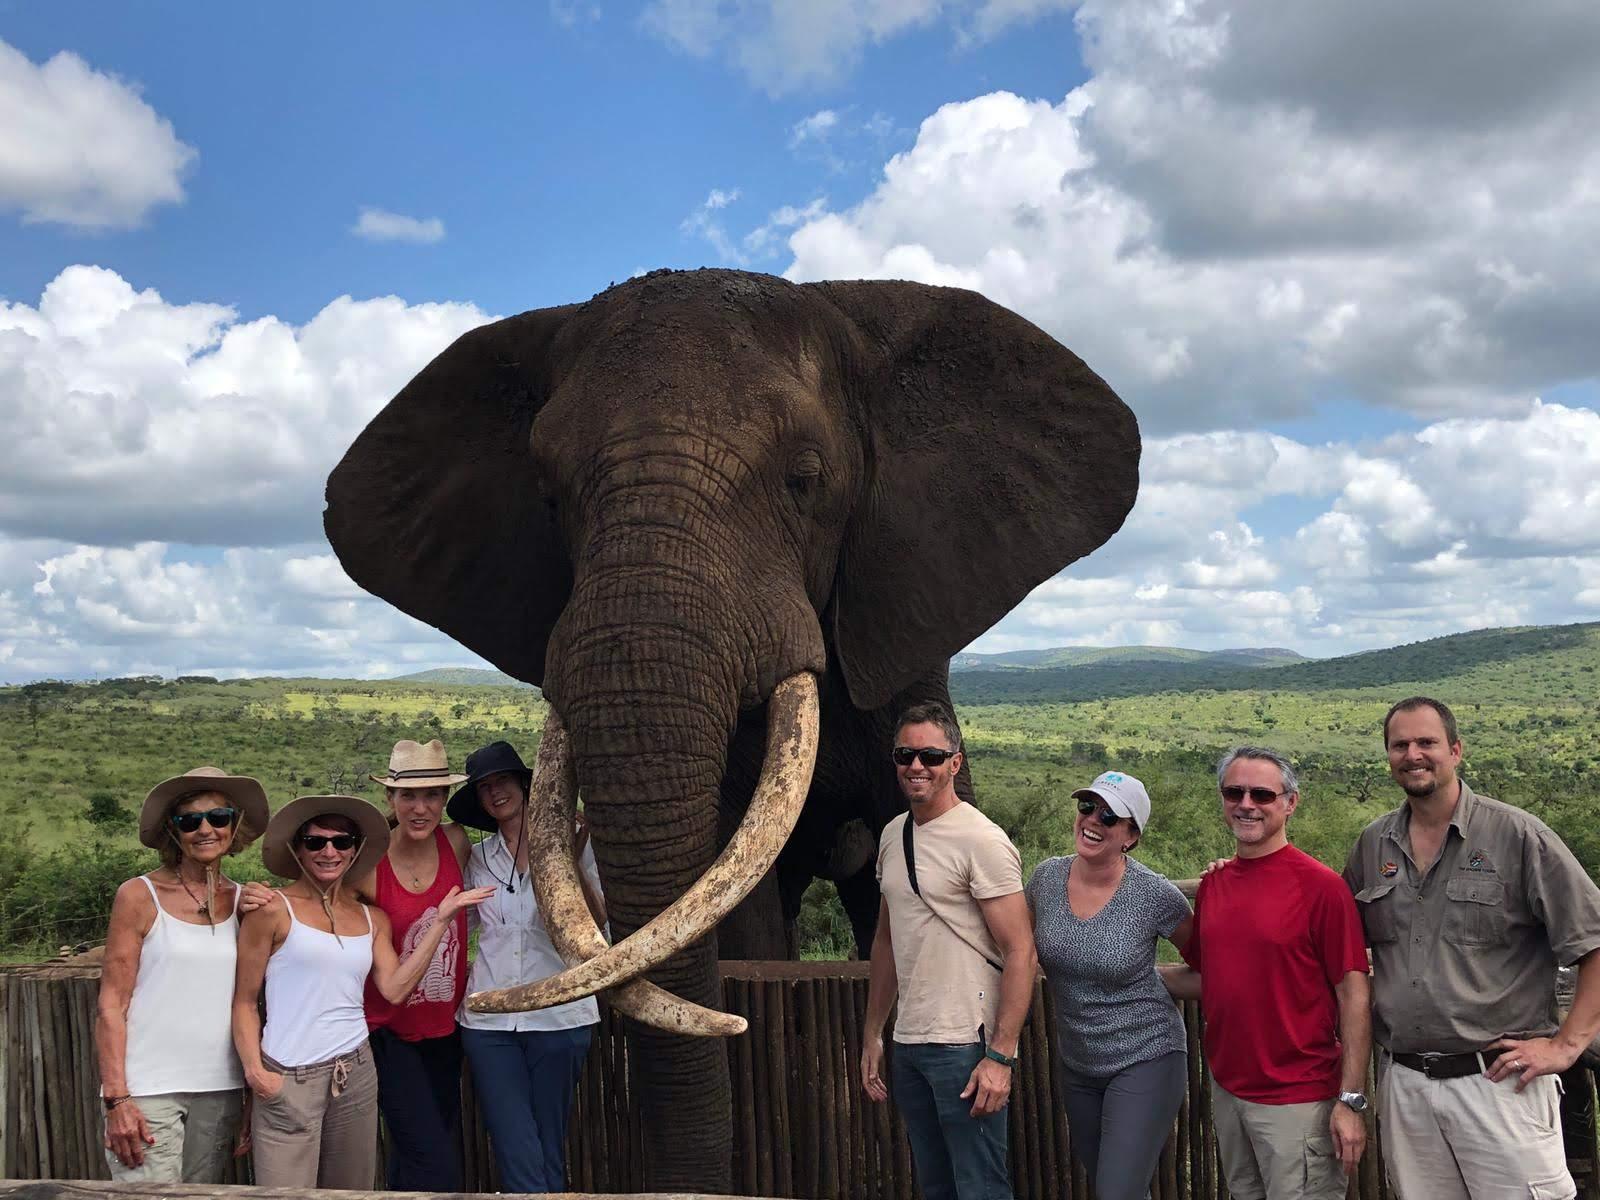 Elephant interaction group